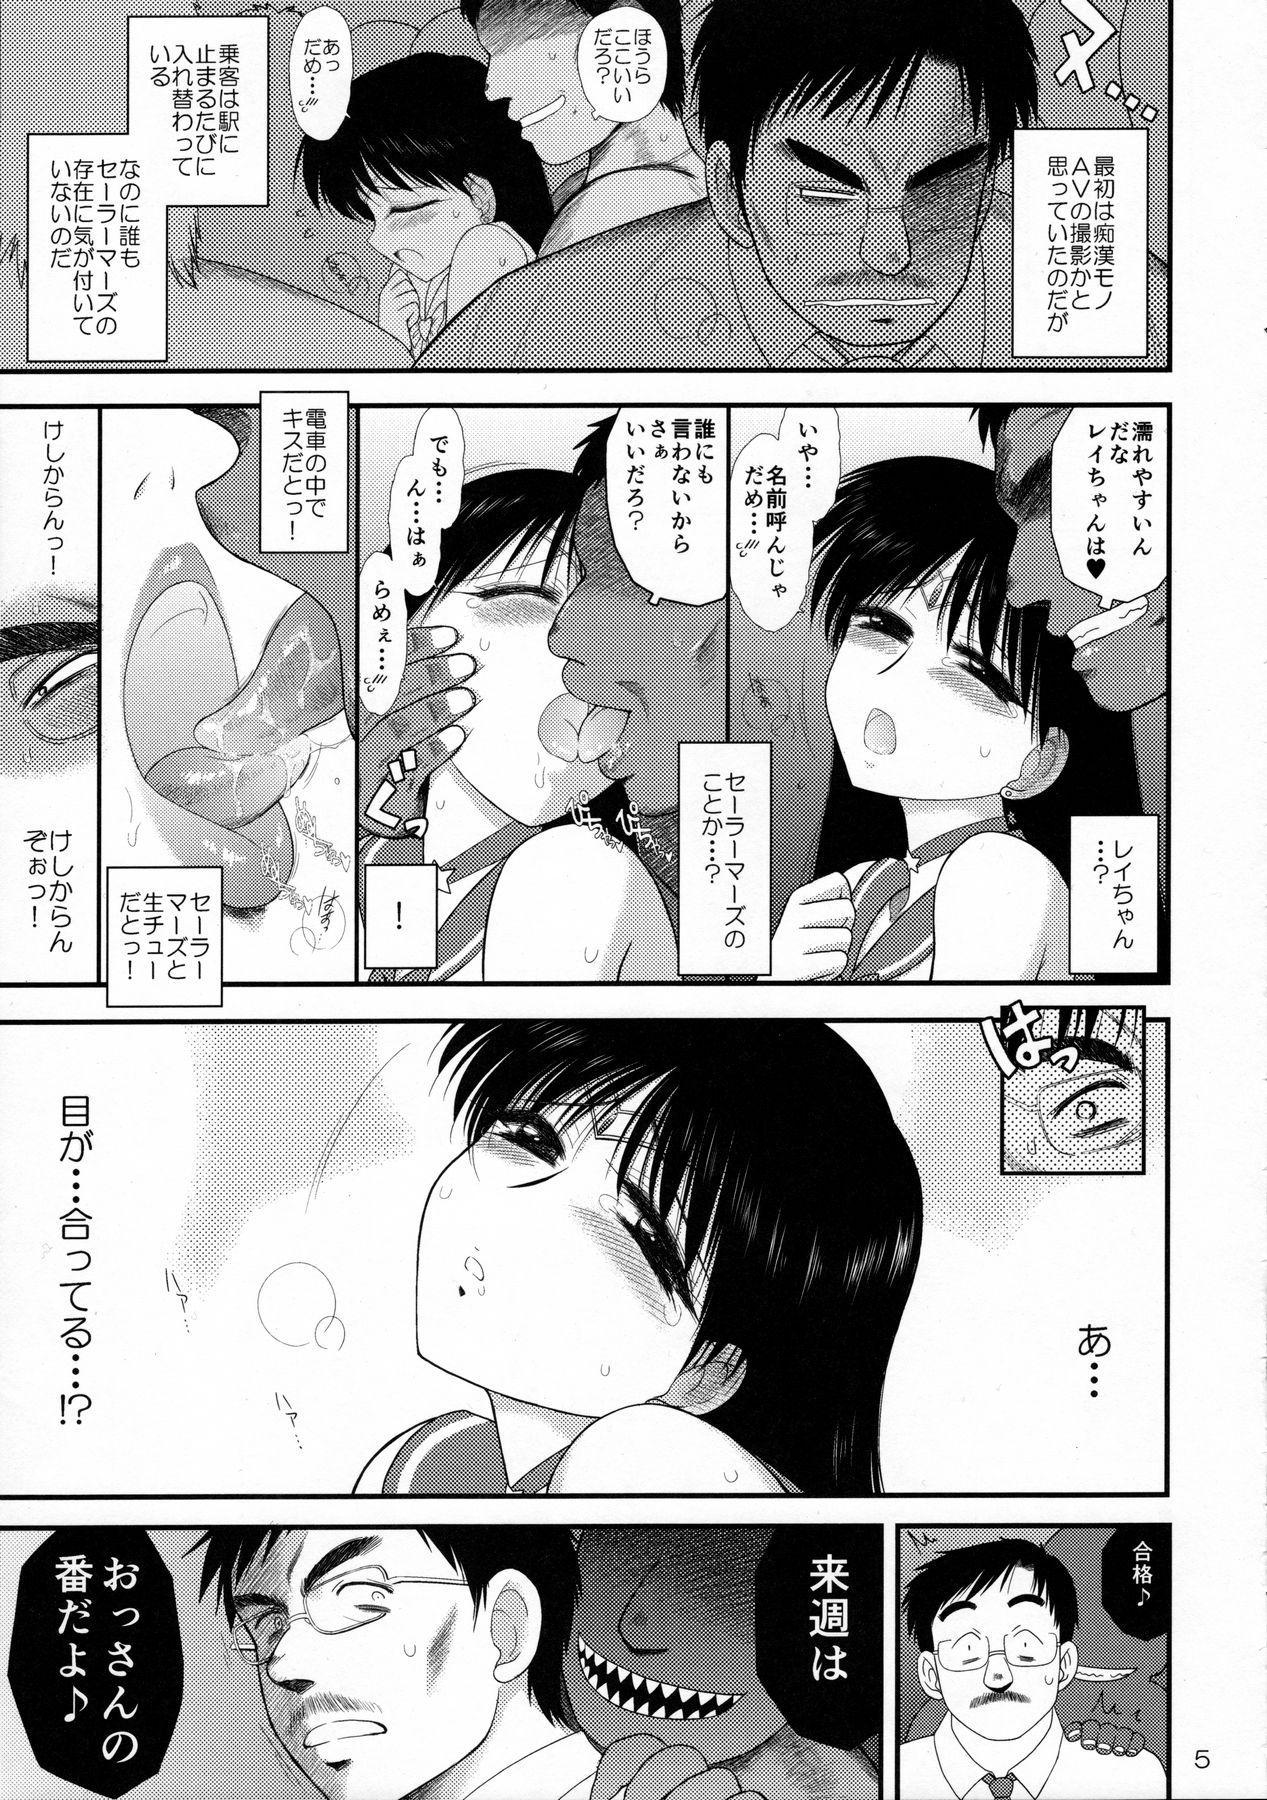 The Fertilization of Rei Hino 4